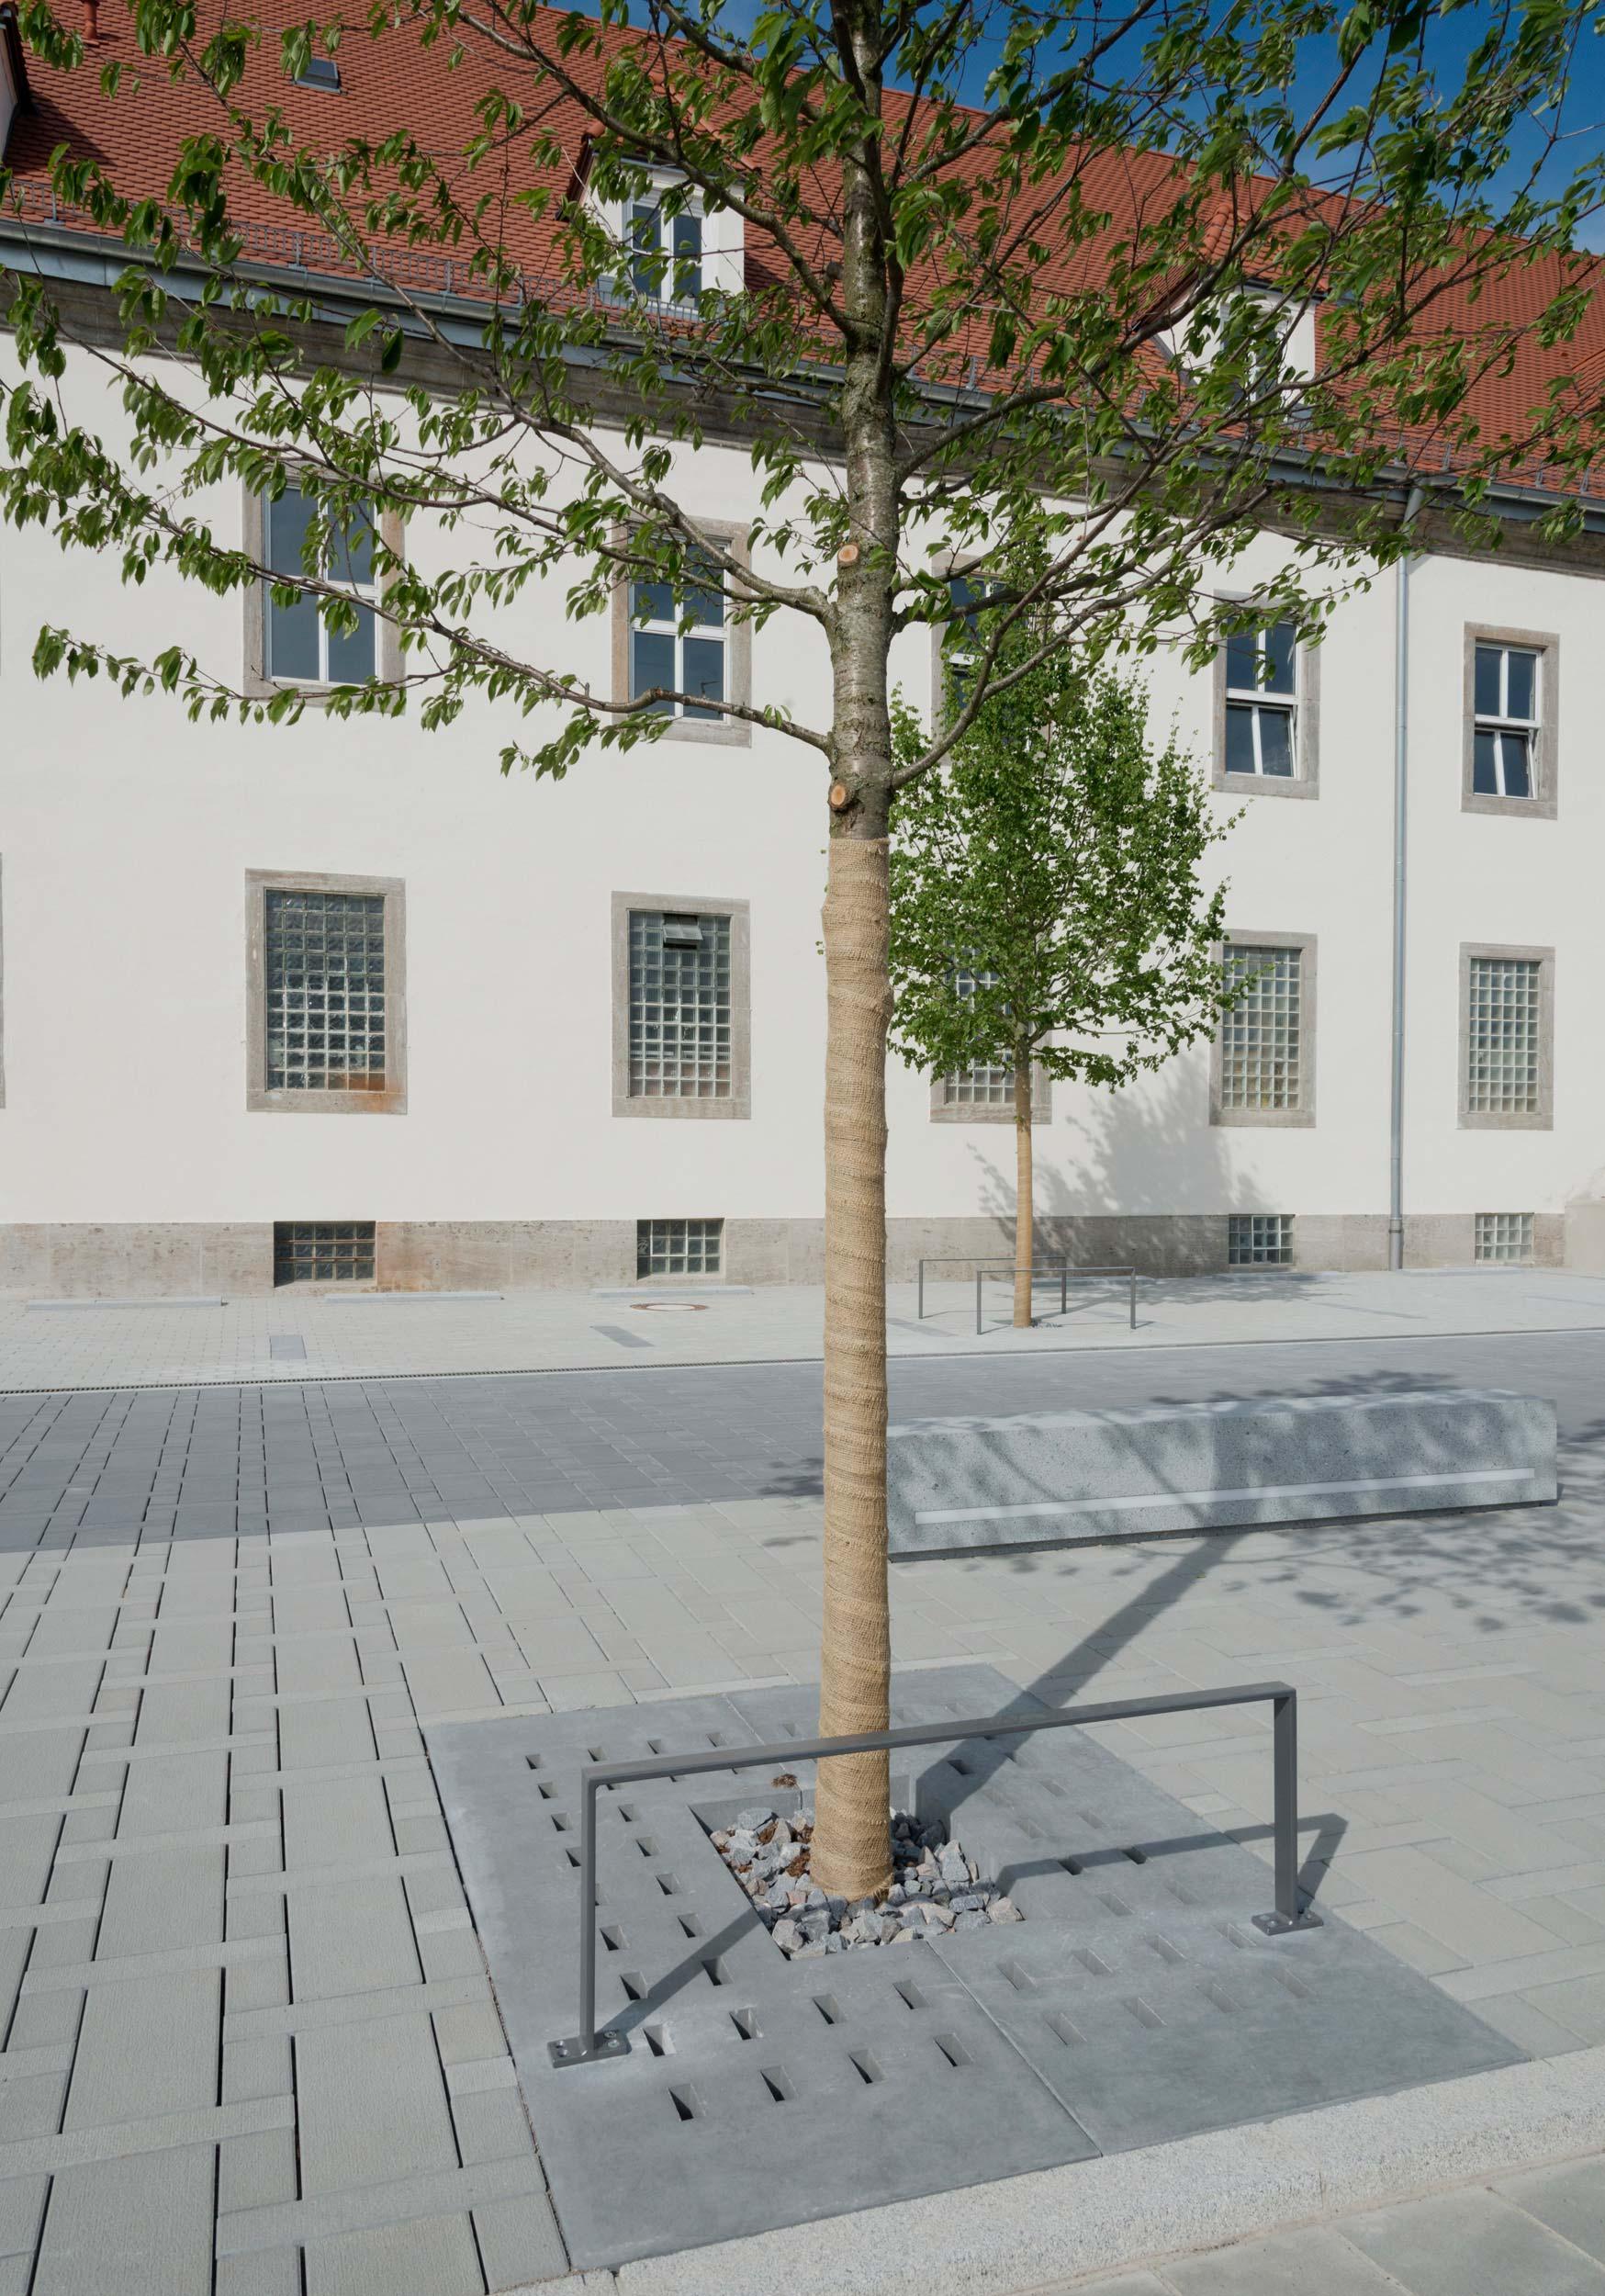 Königsberger Strasse